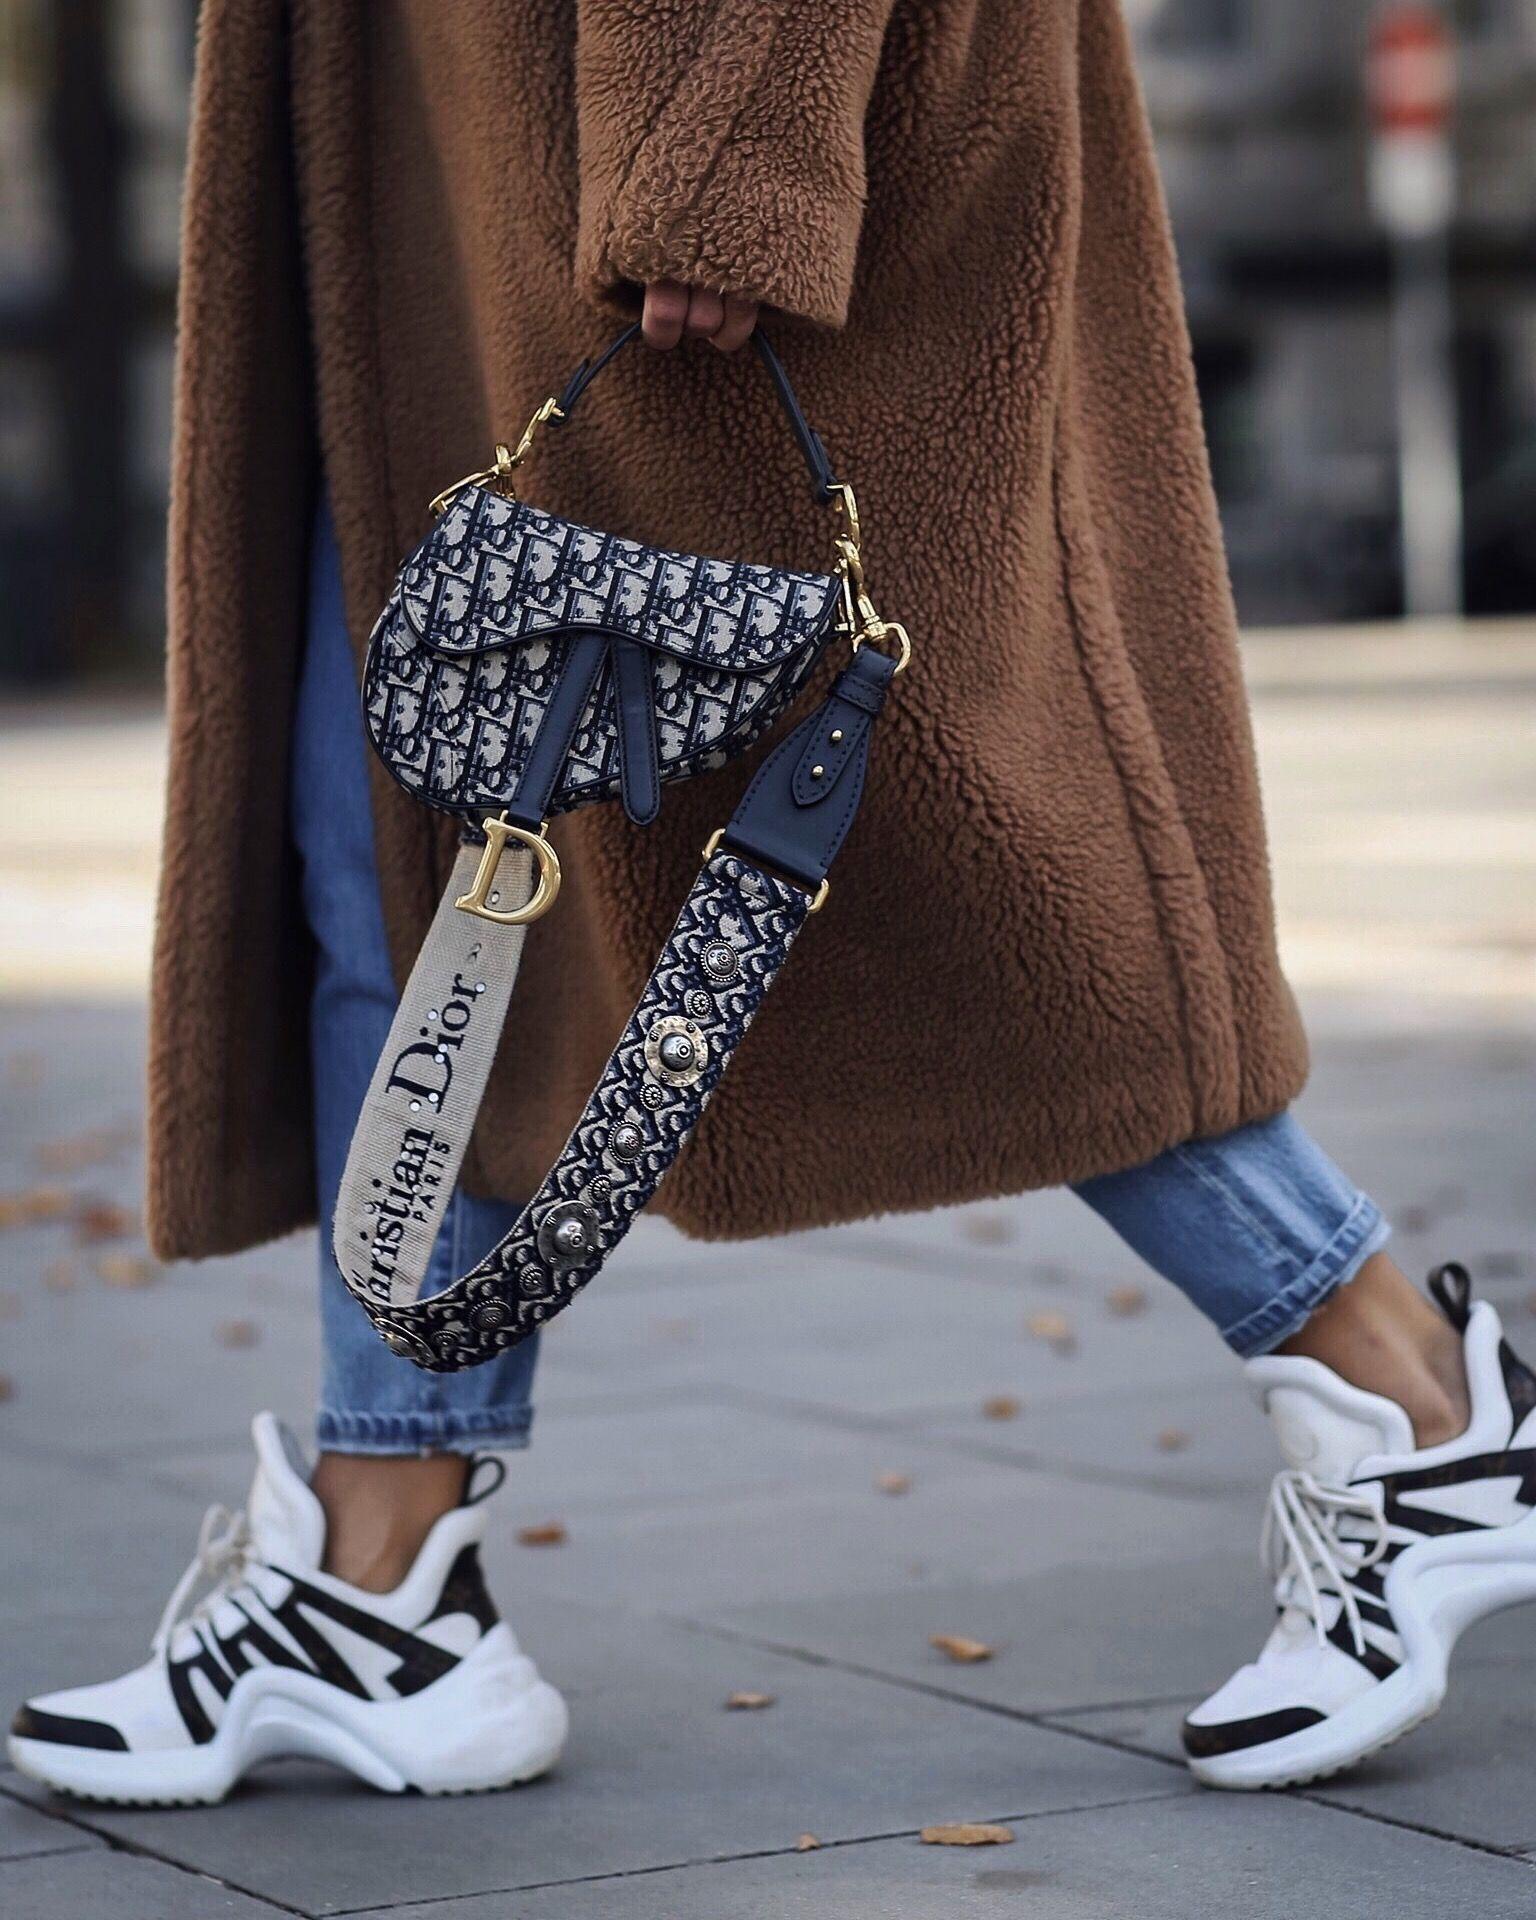 gitranegie || fashion | trends | street Style | fashion week | inspiration | outfit | urban | streetlook | streetchic | fashionista